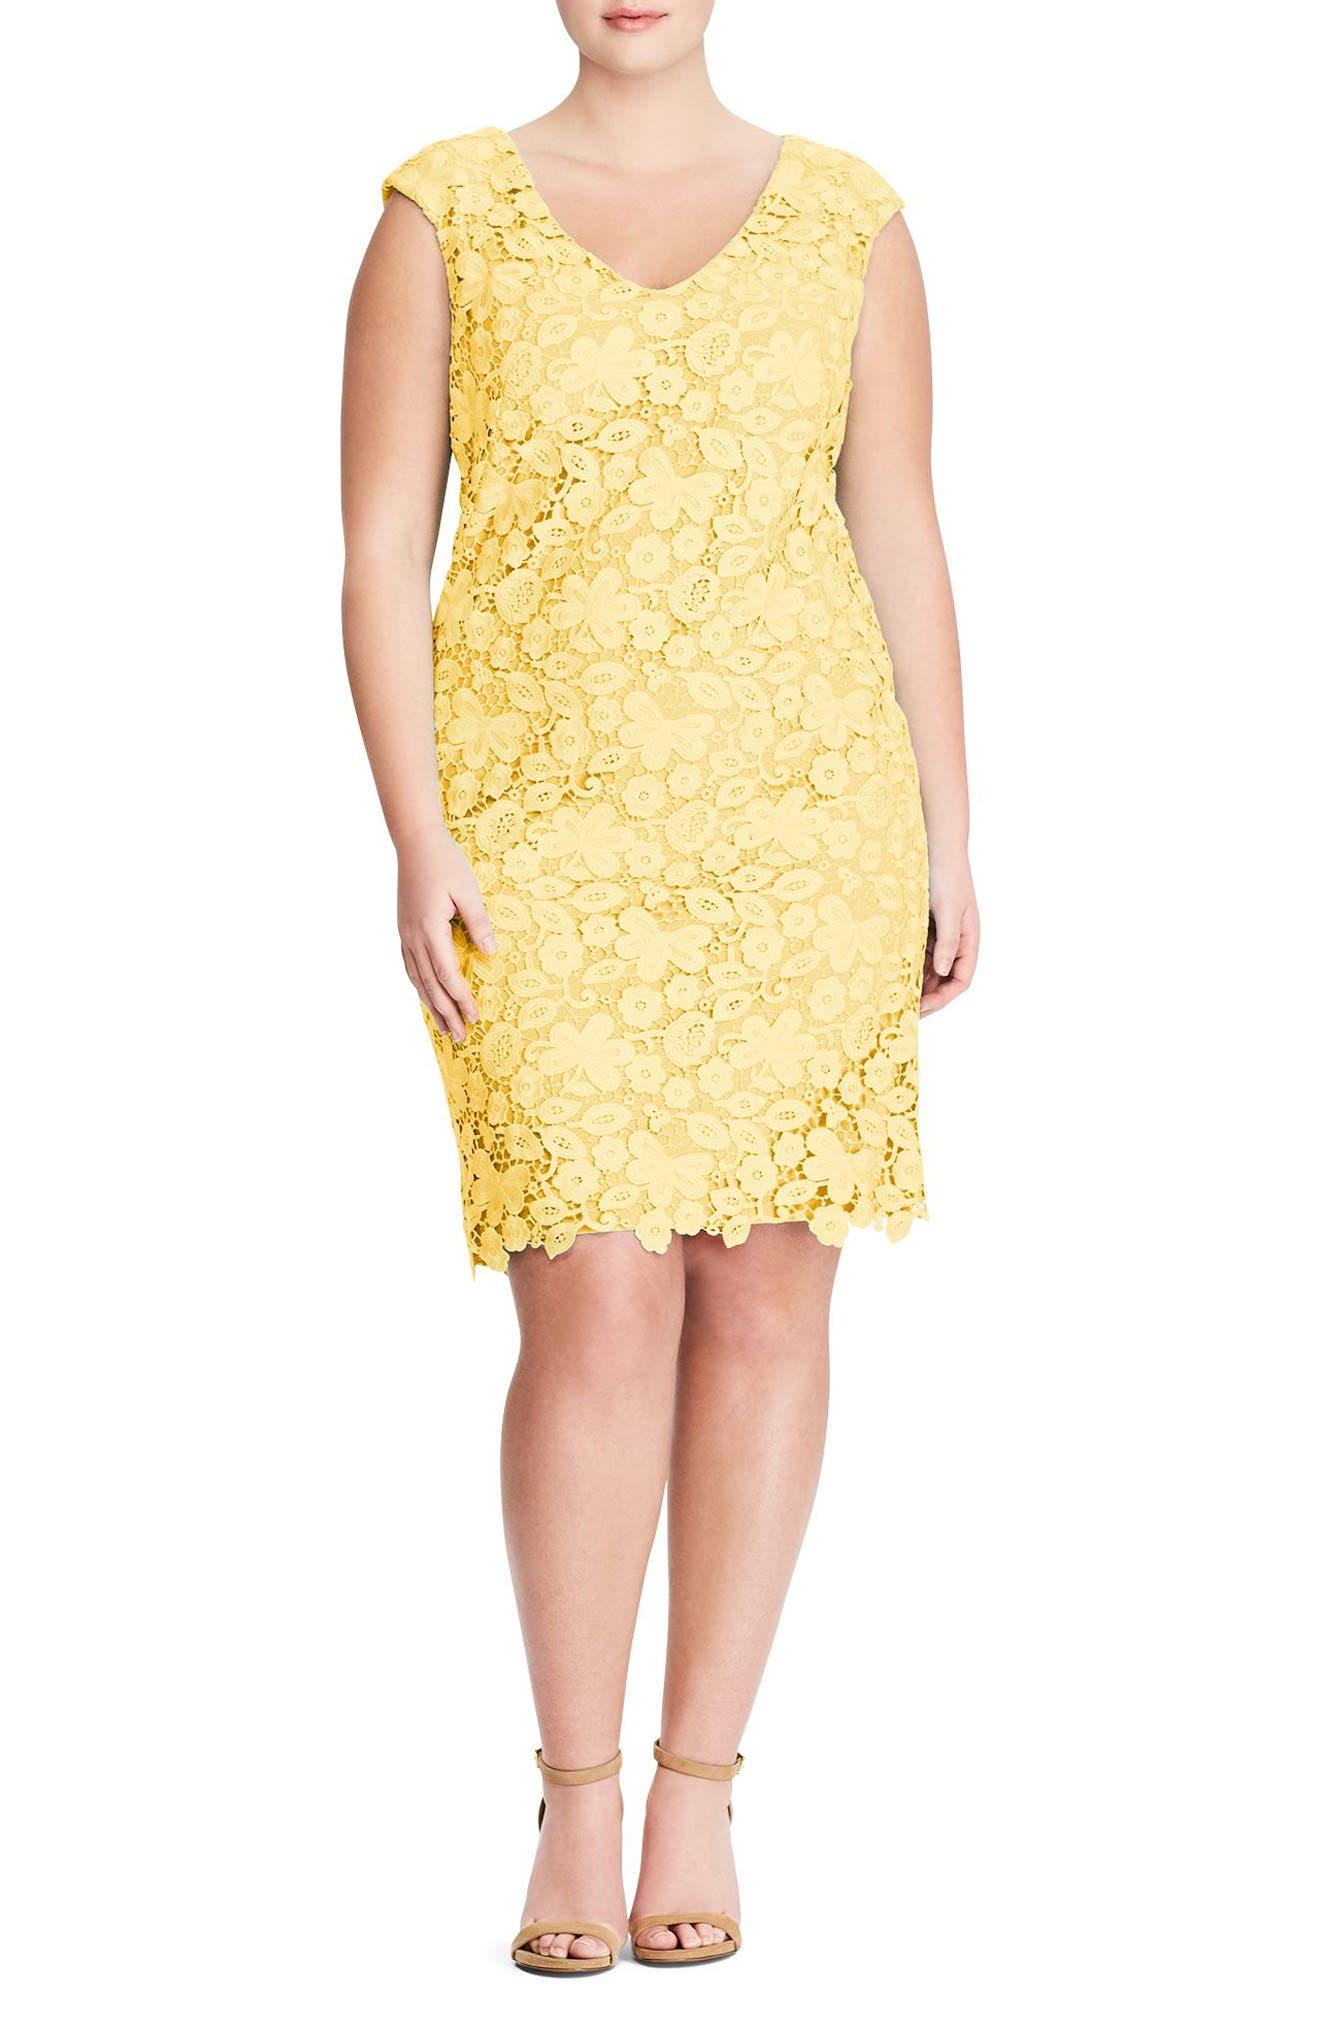 Montie Lace Sheath Dress,                             Main thumbnail 1, color,                             Island Yellow